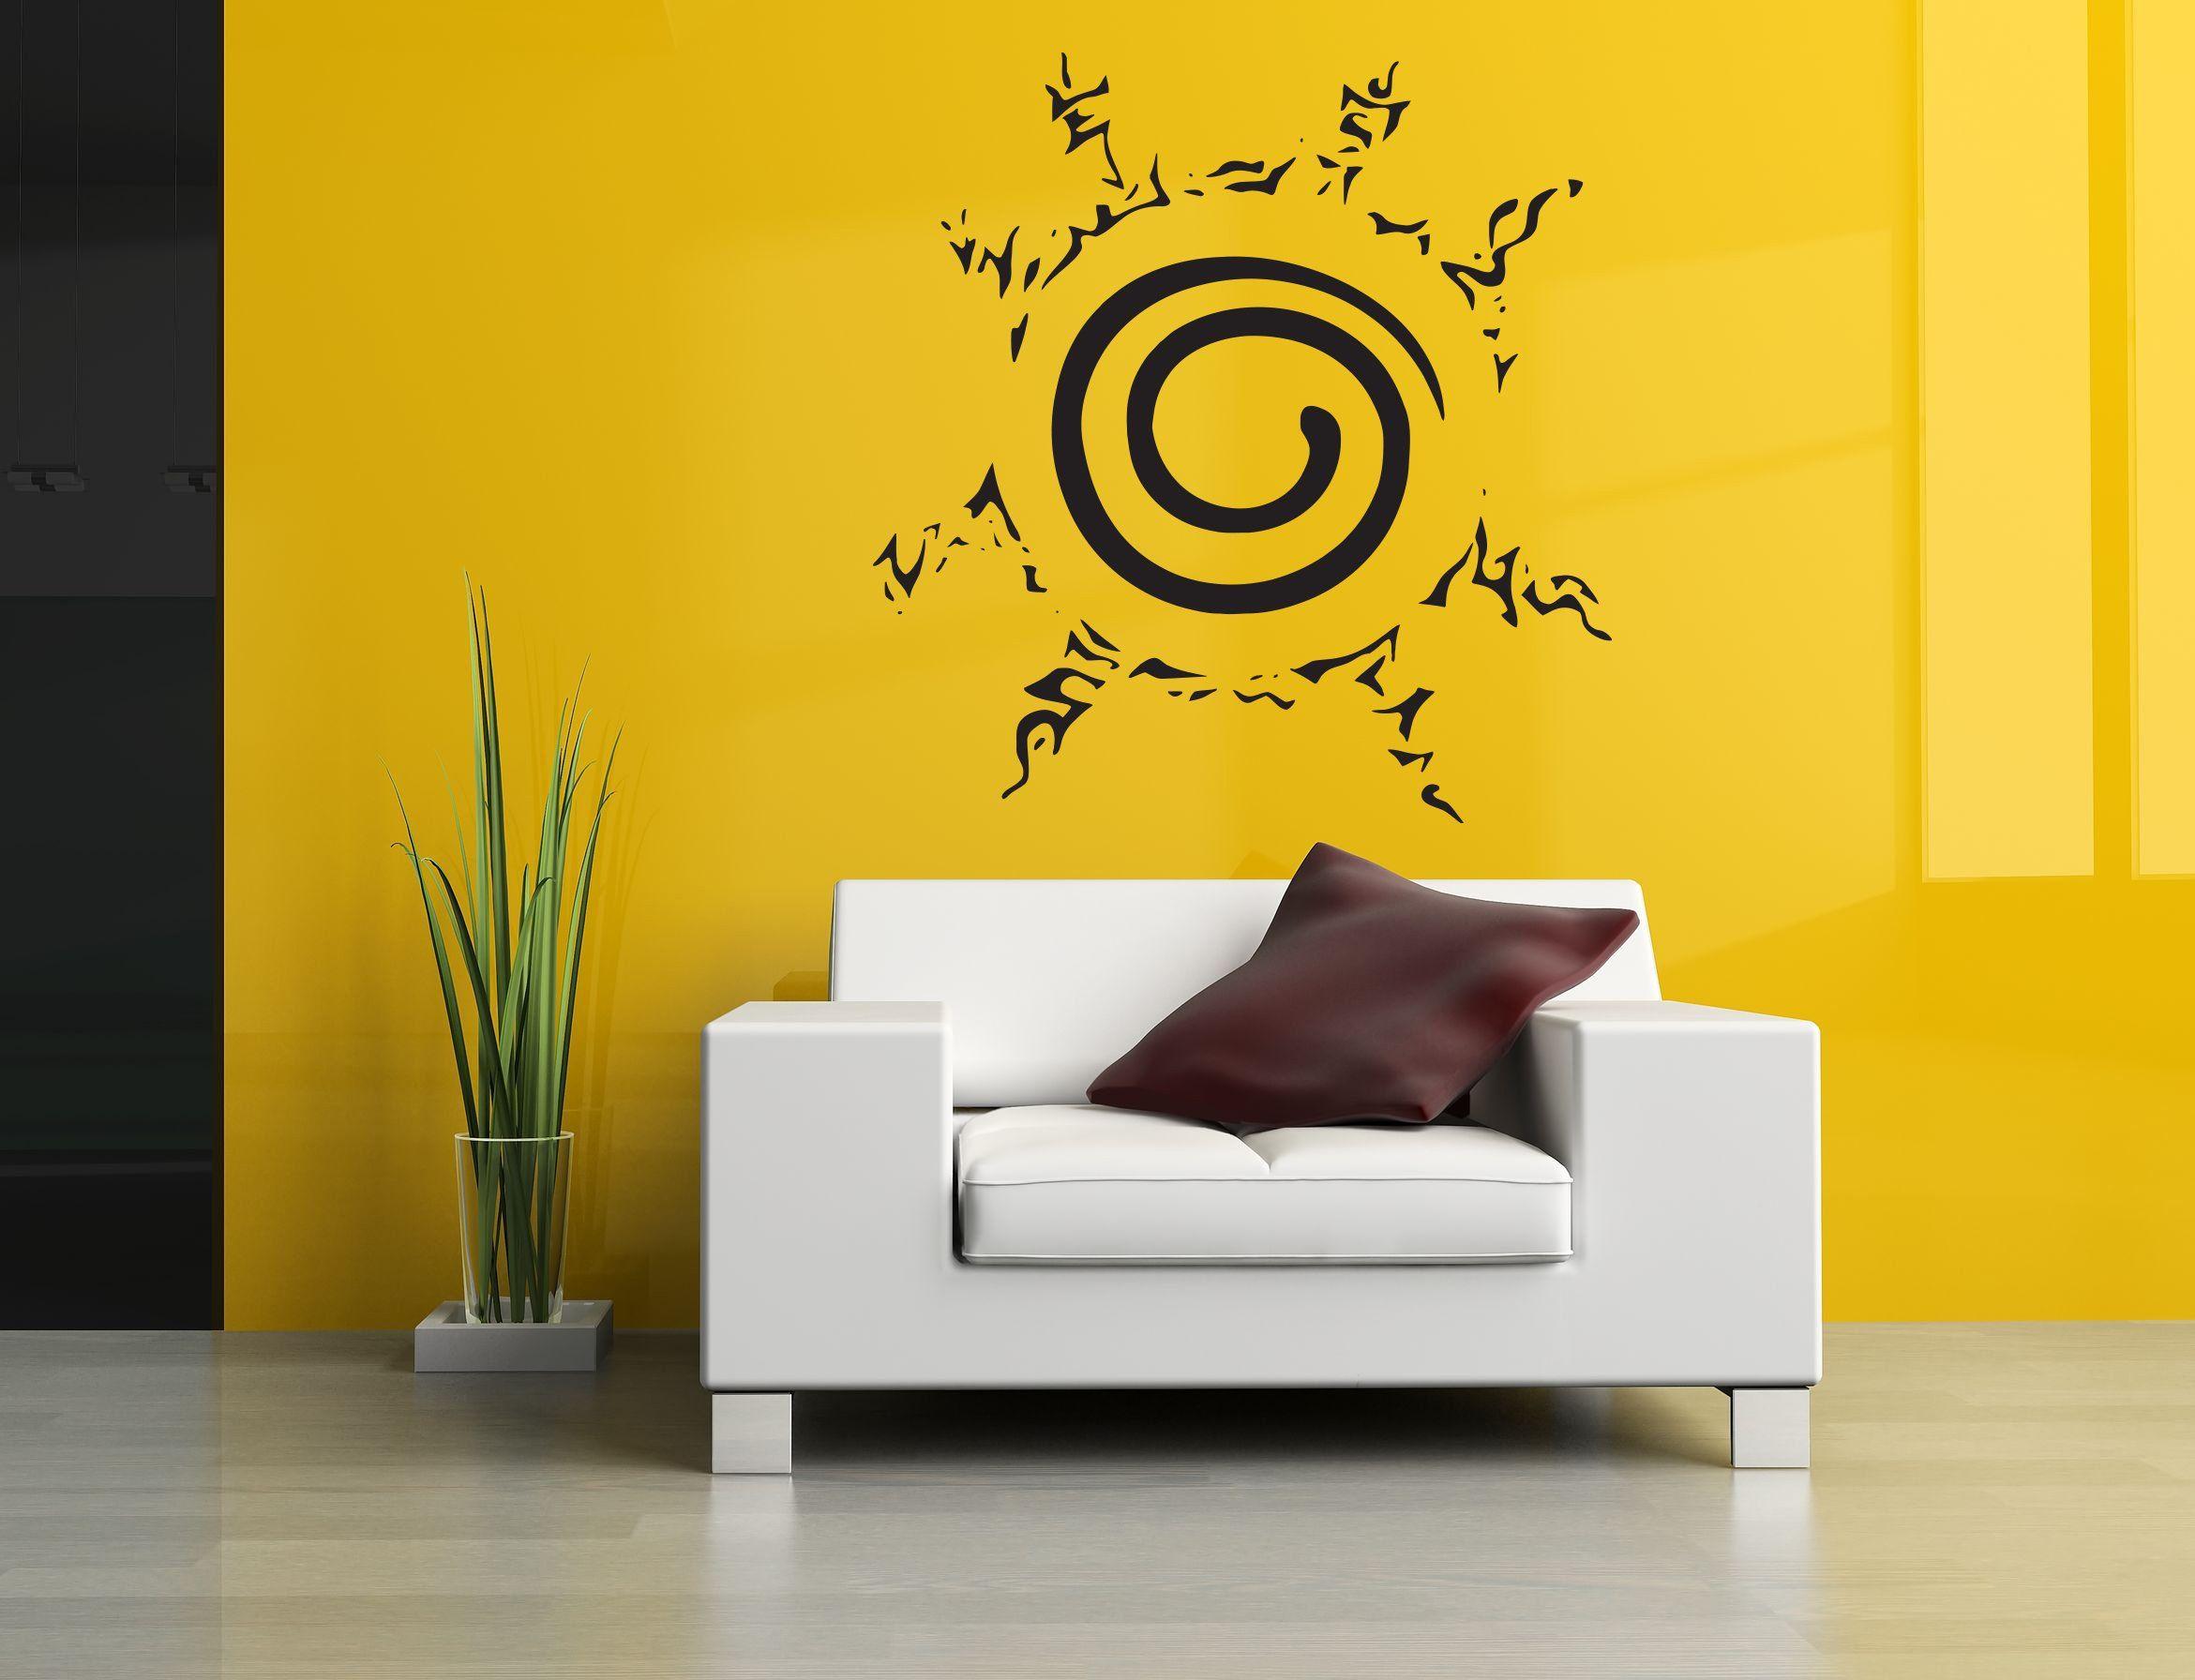 Wall Room Decor Art Vinyl Sticker Mural Decal Naruto Cartoon Ninja ...